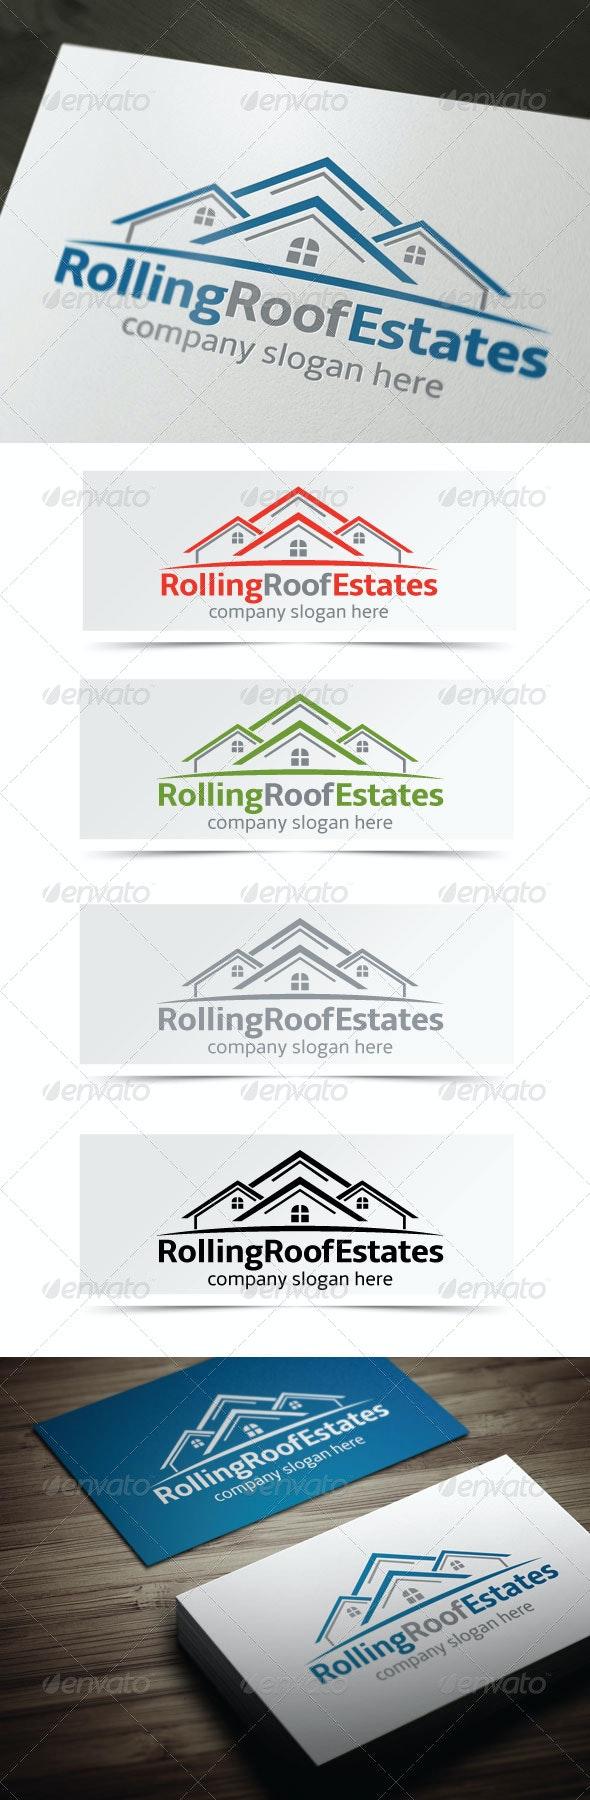 Rolling Roof Estates - Buildings Logo Templates